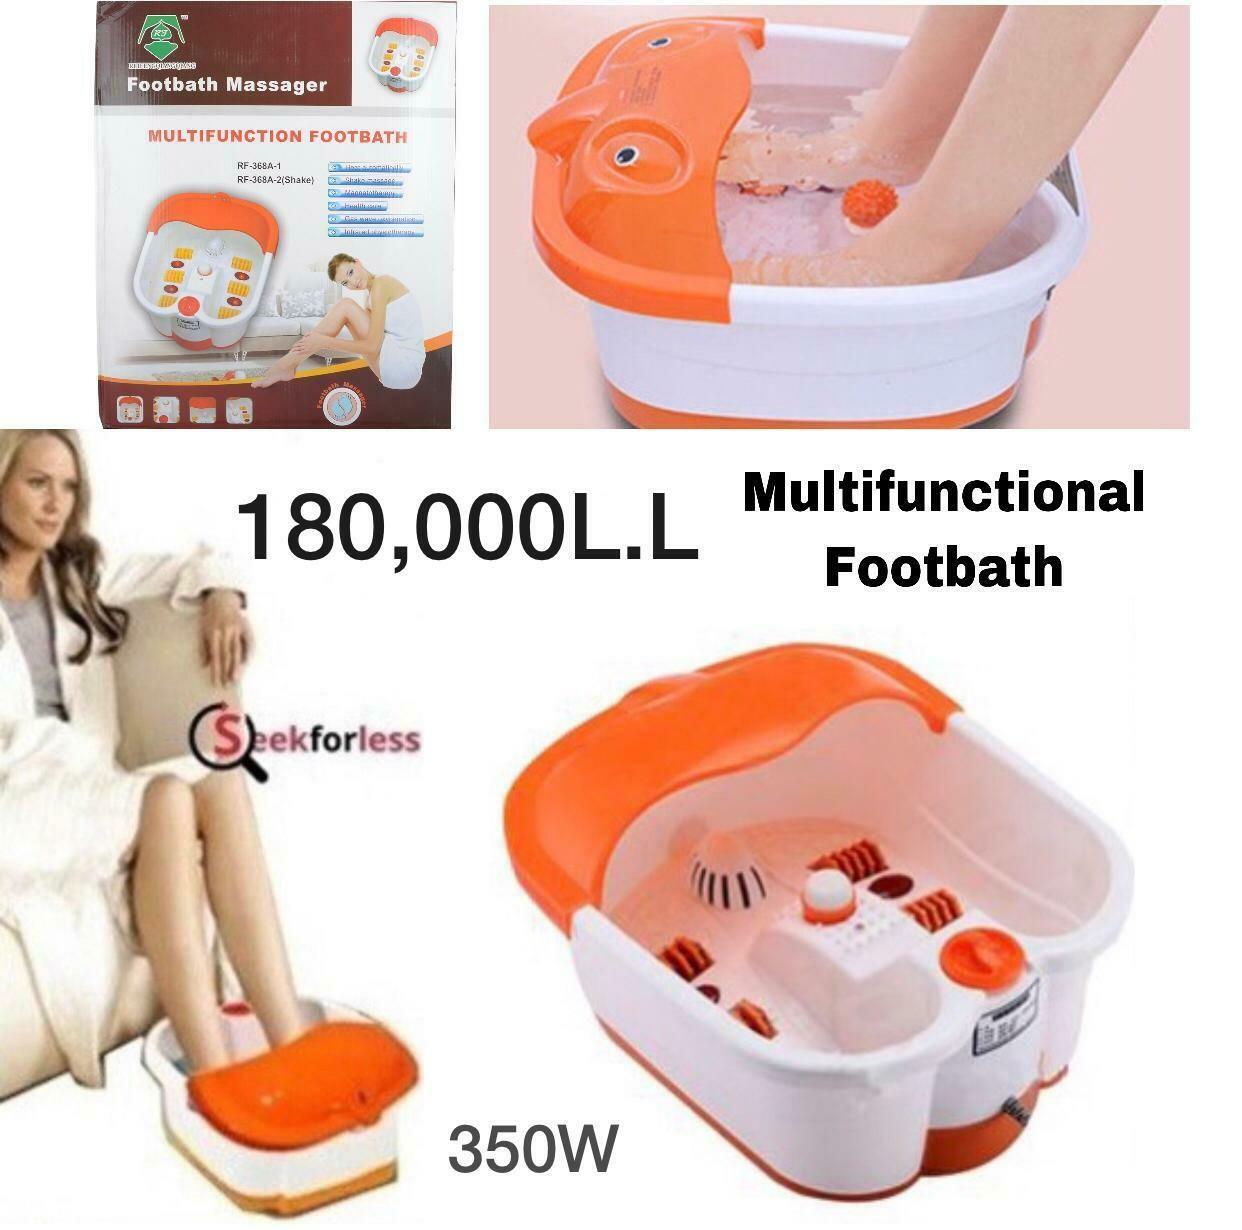 Multifunctional Footbath